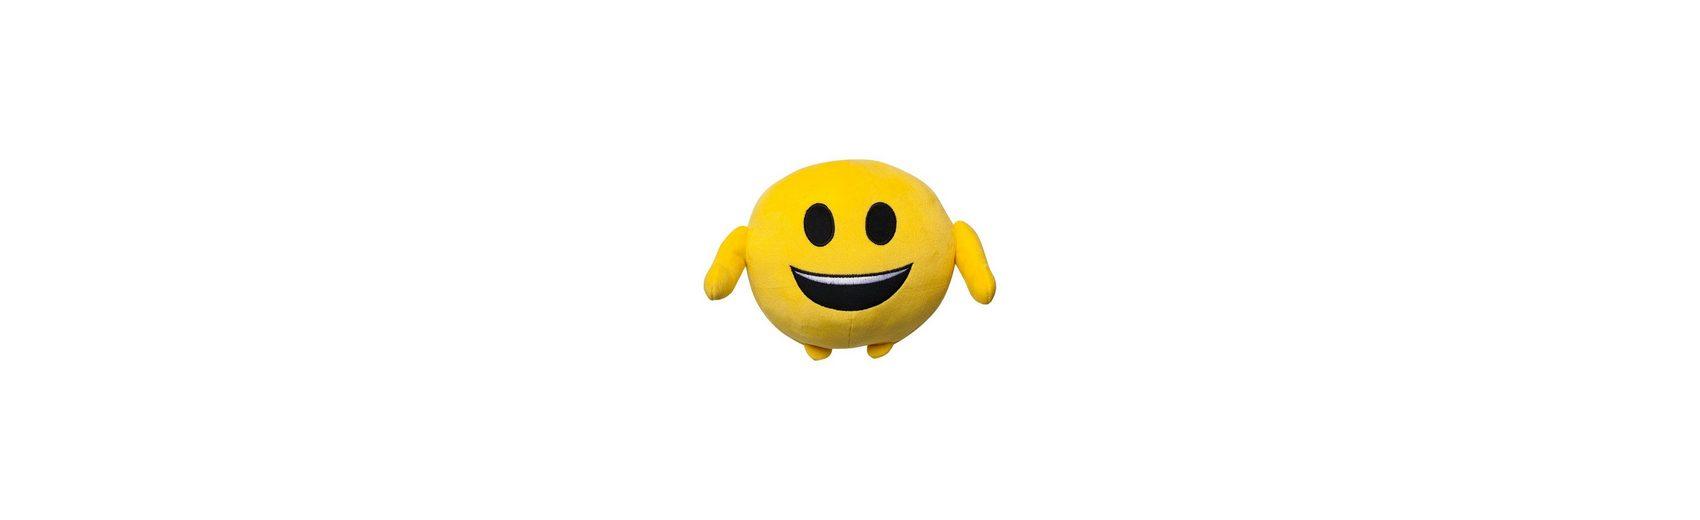 BOTI Imoji Plüschfigur in Ballform Classic Smile, 18cm